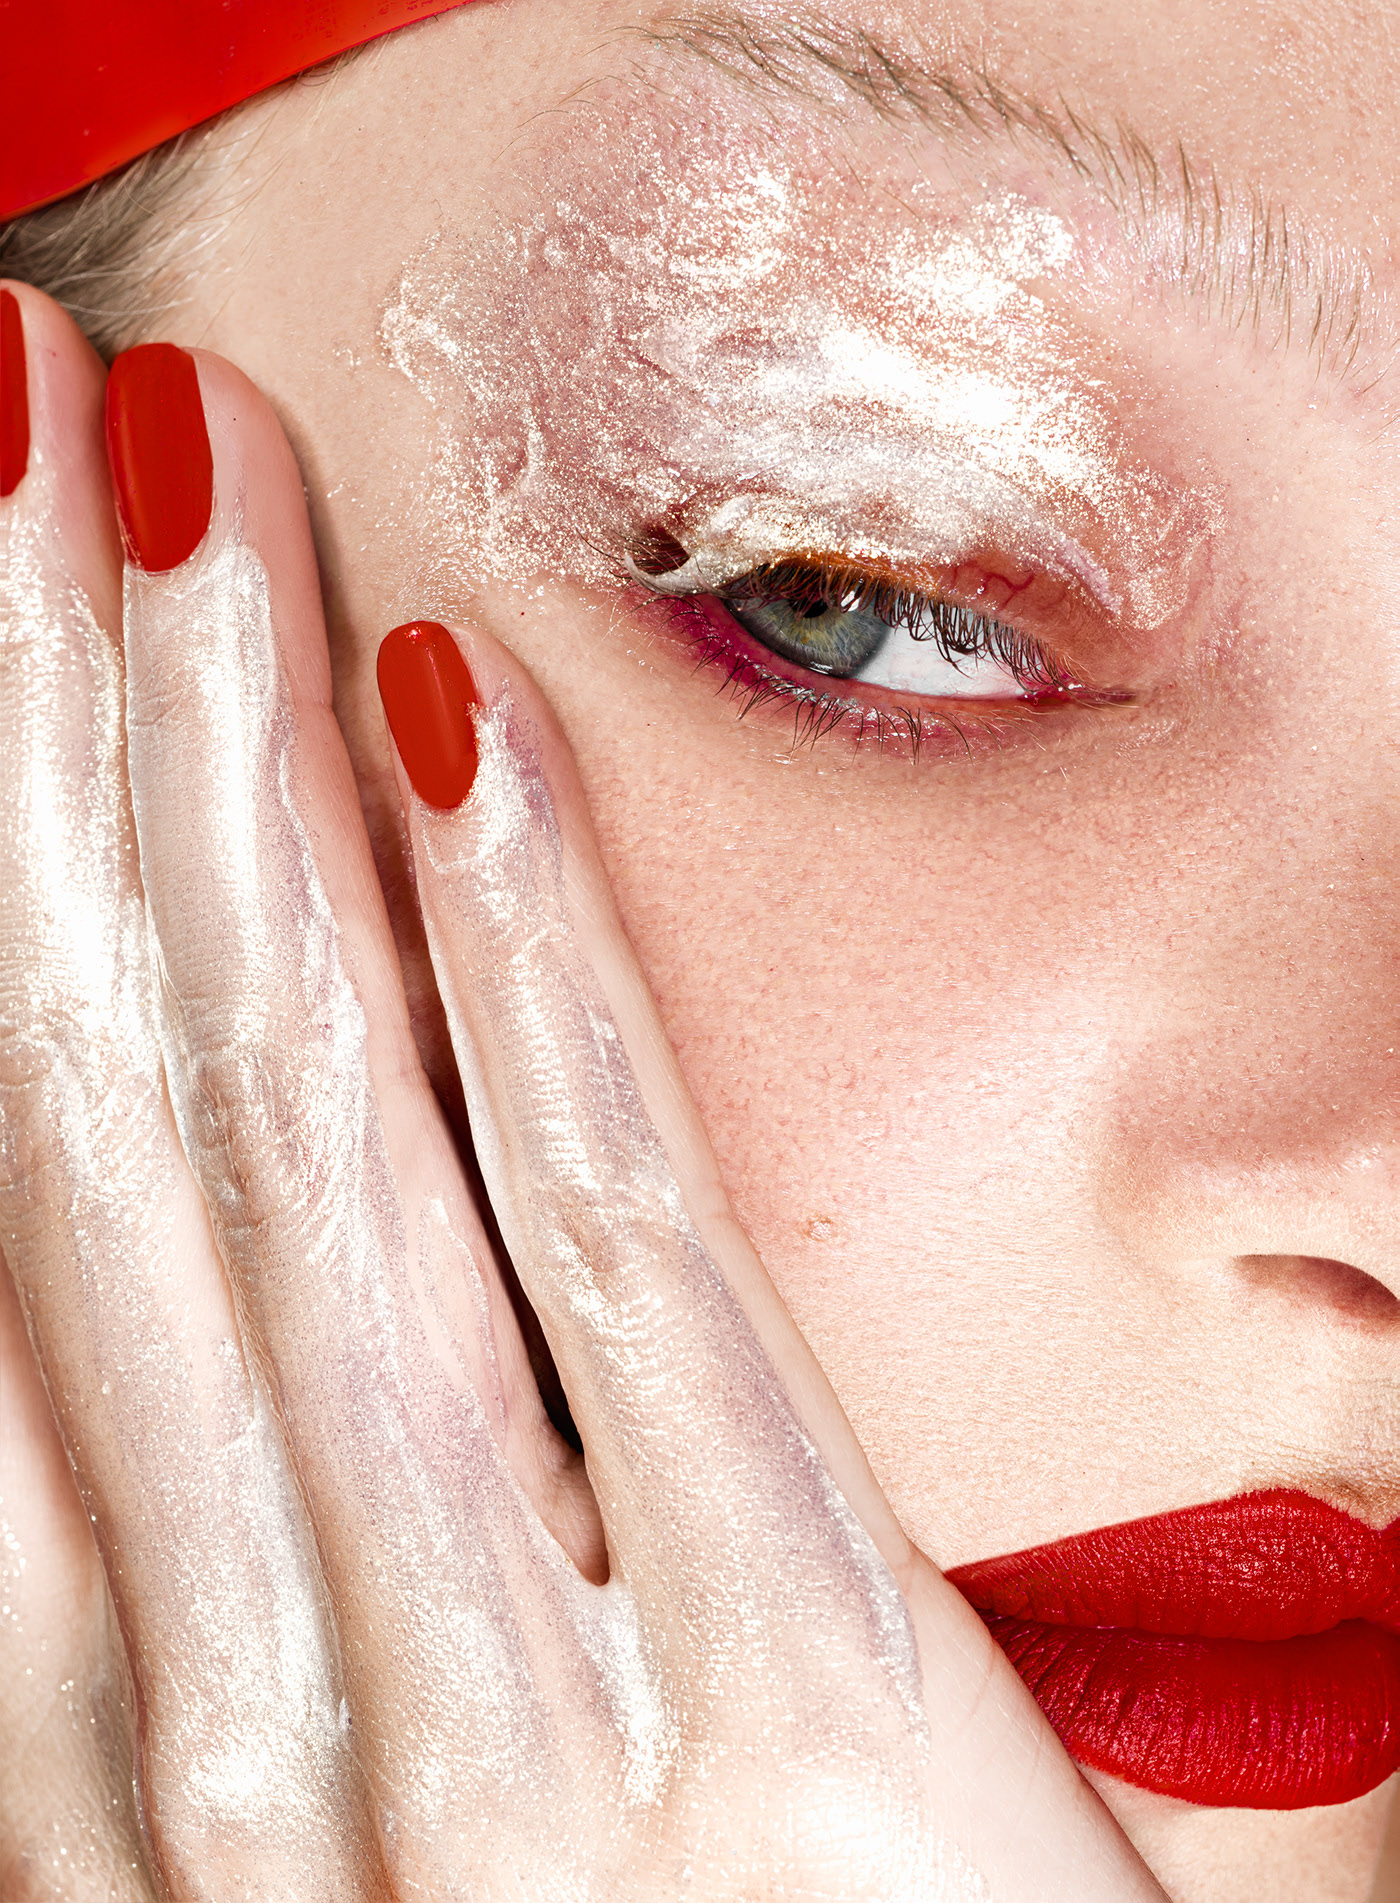 All about the reds | Valerie Vialo - foto Elena Iv-skaya